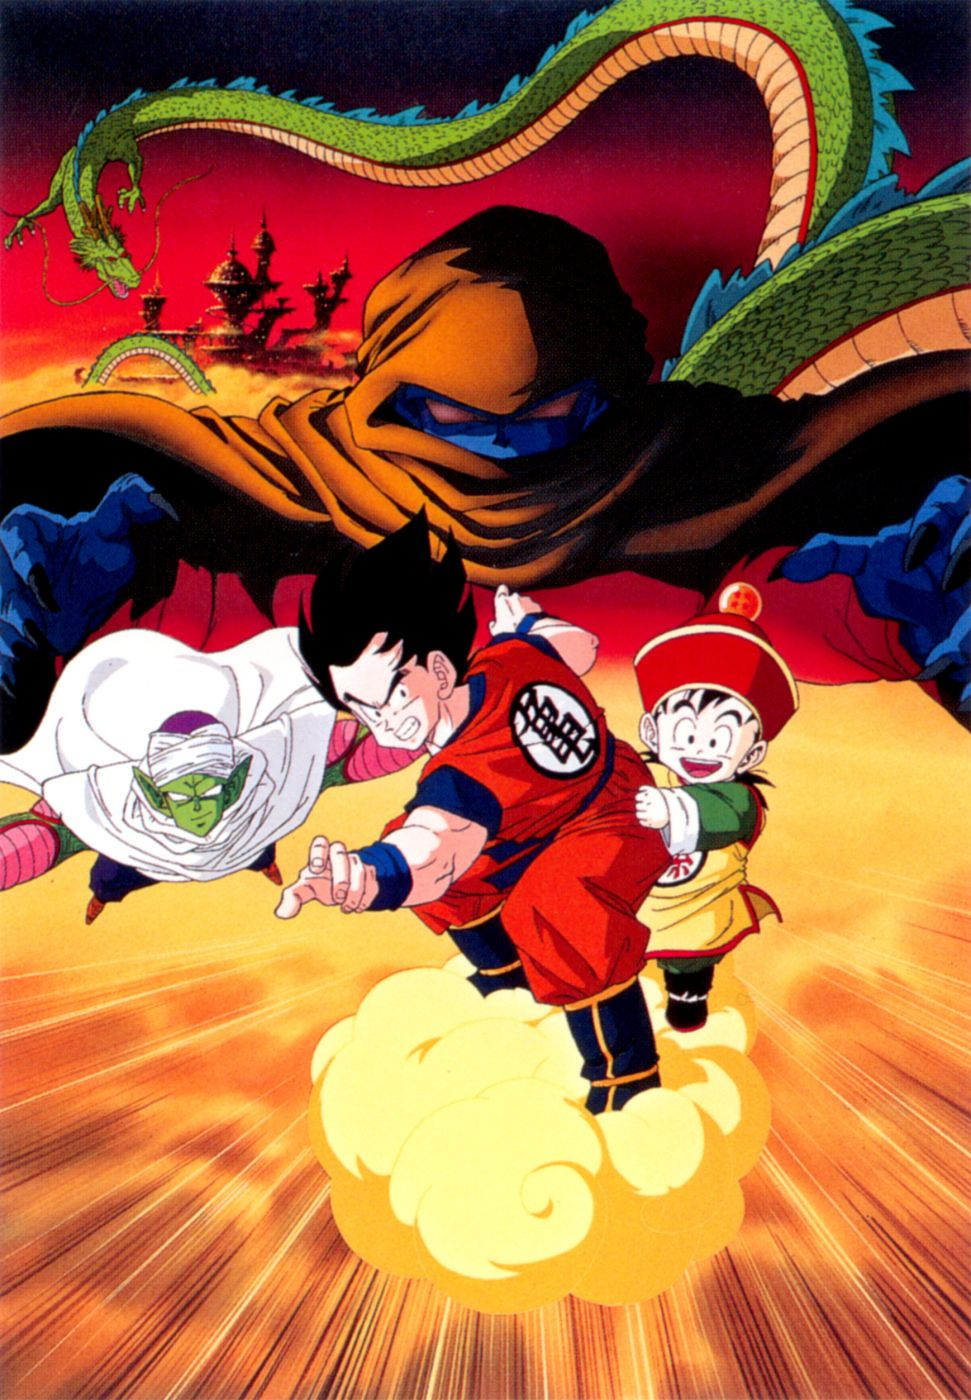 80s 90s Dragon Ball Art Photo Dragon Ball Art Dragon Ball Z Anime Dragon Ball See more ideas about fan art, kpop fanart, nu est. 80s 90s dragon ball art photo